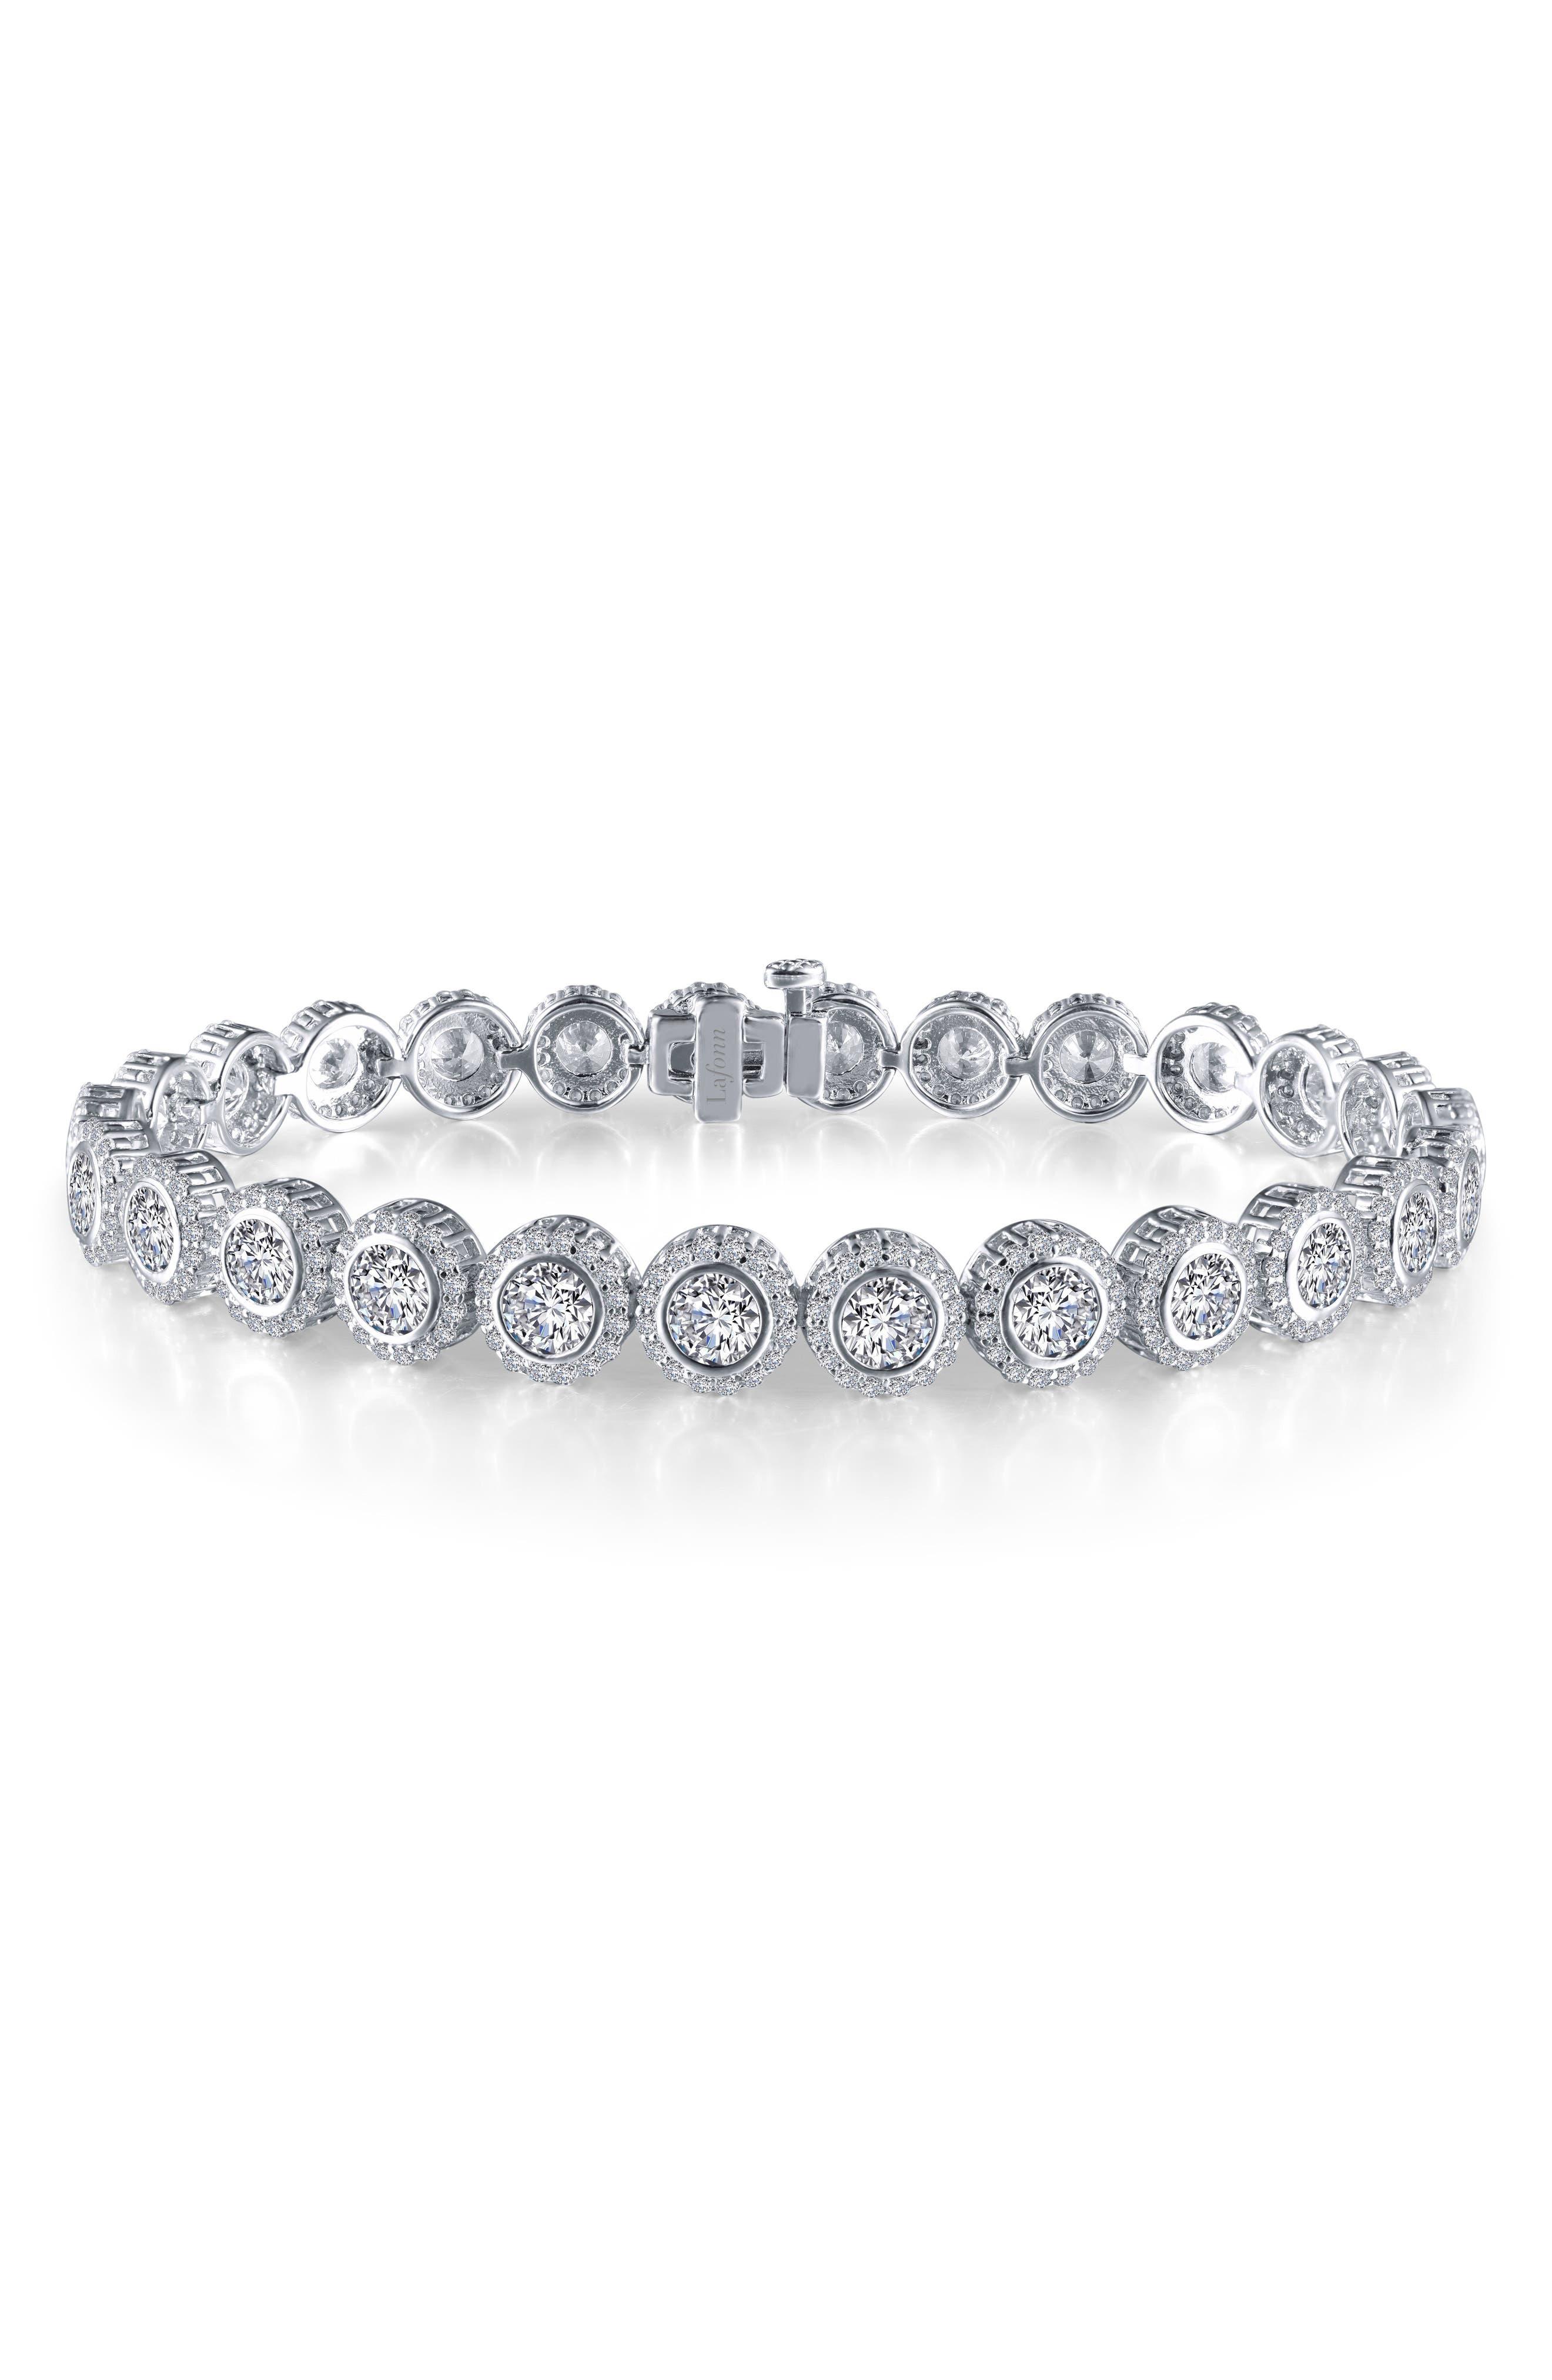 Halo Simulated Diamond Tennis Bracelet,                             Main thumbnail 1, color,                             SILVER/ CLEAR